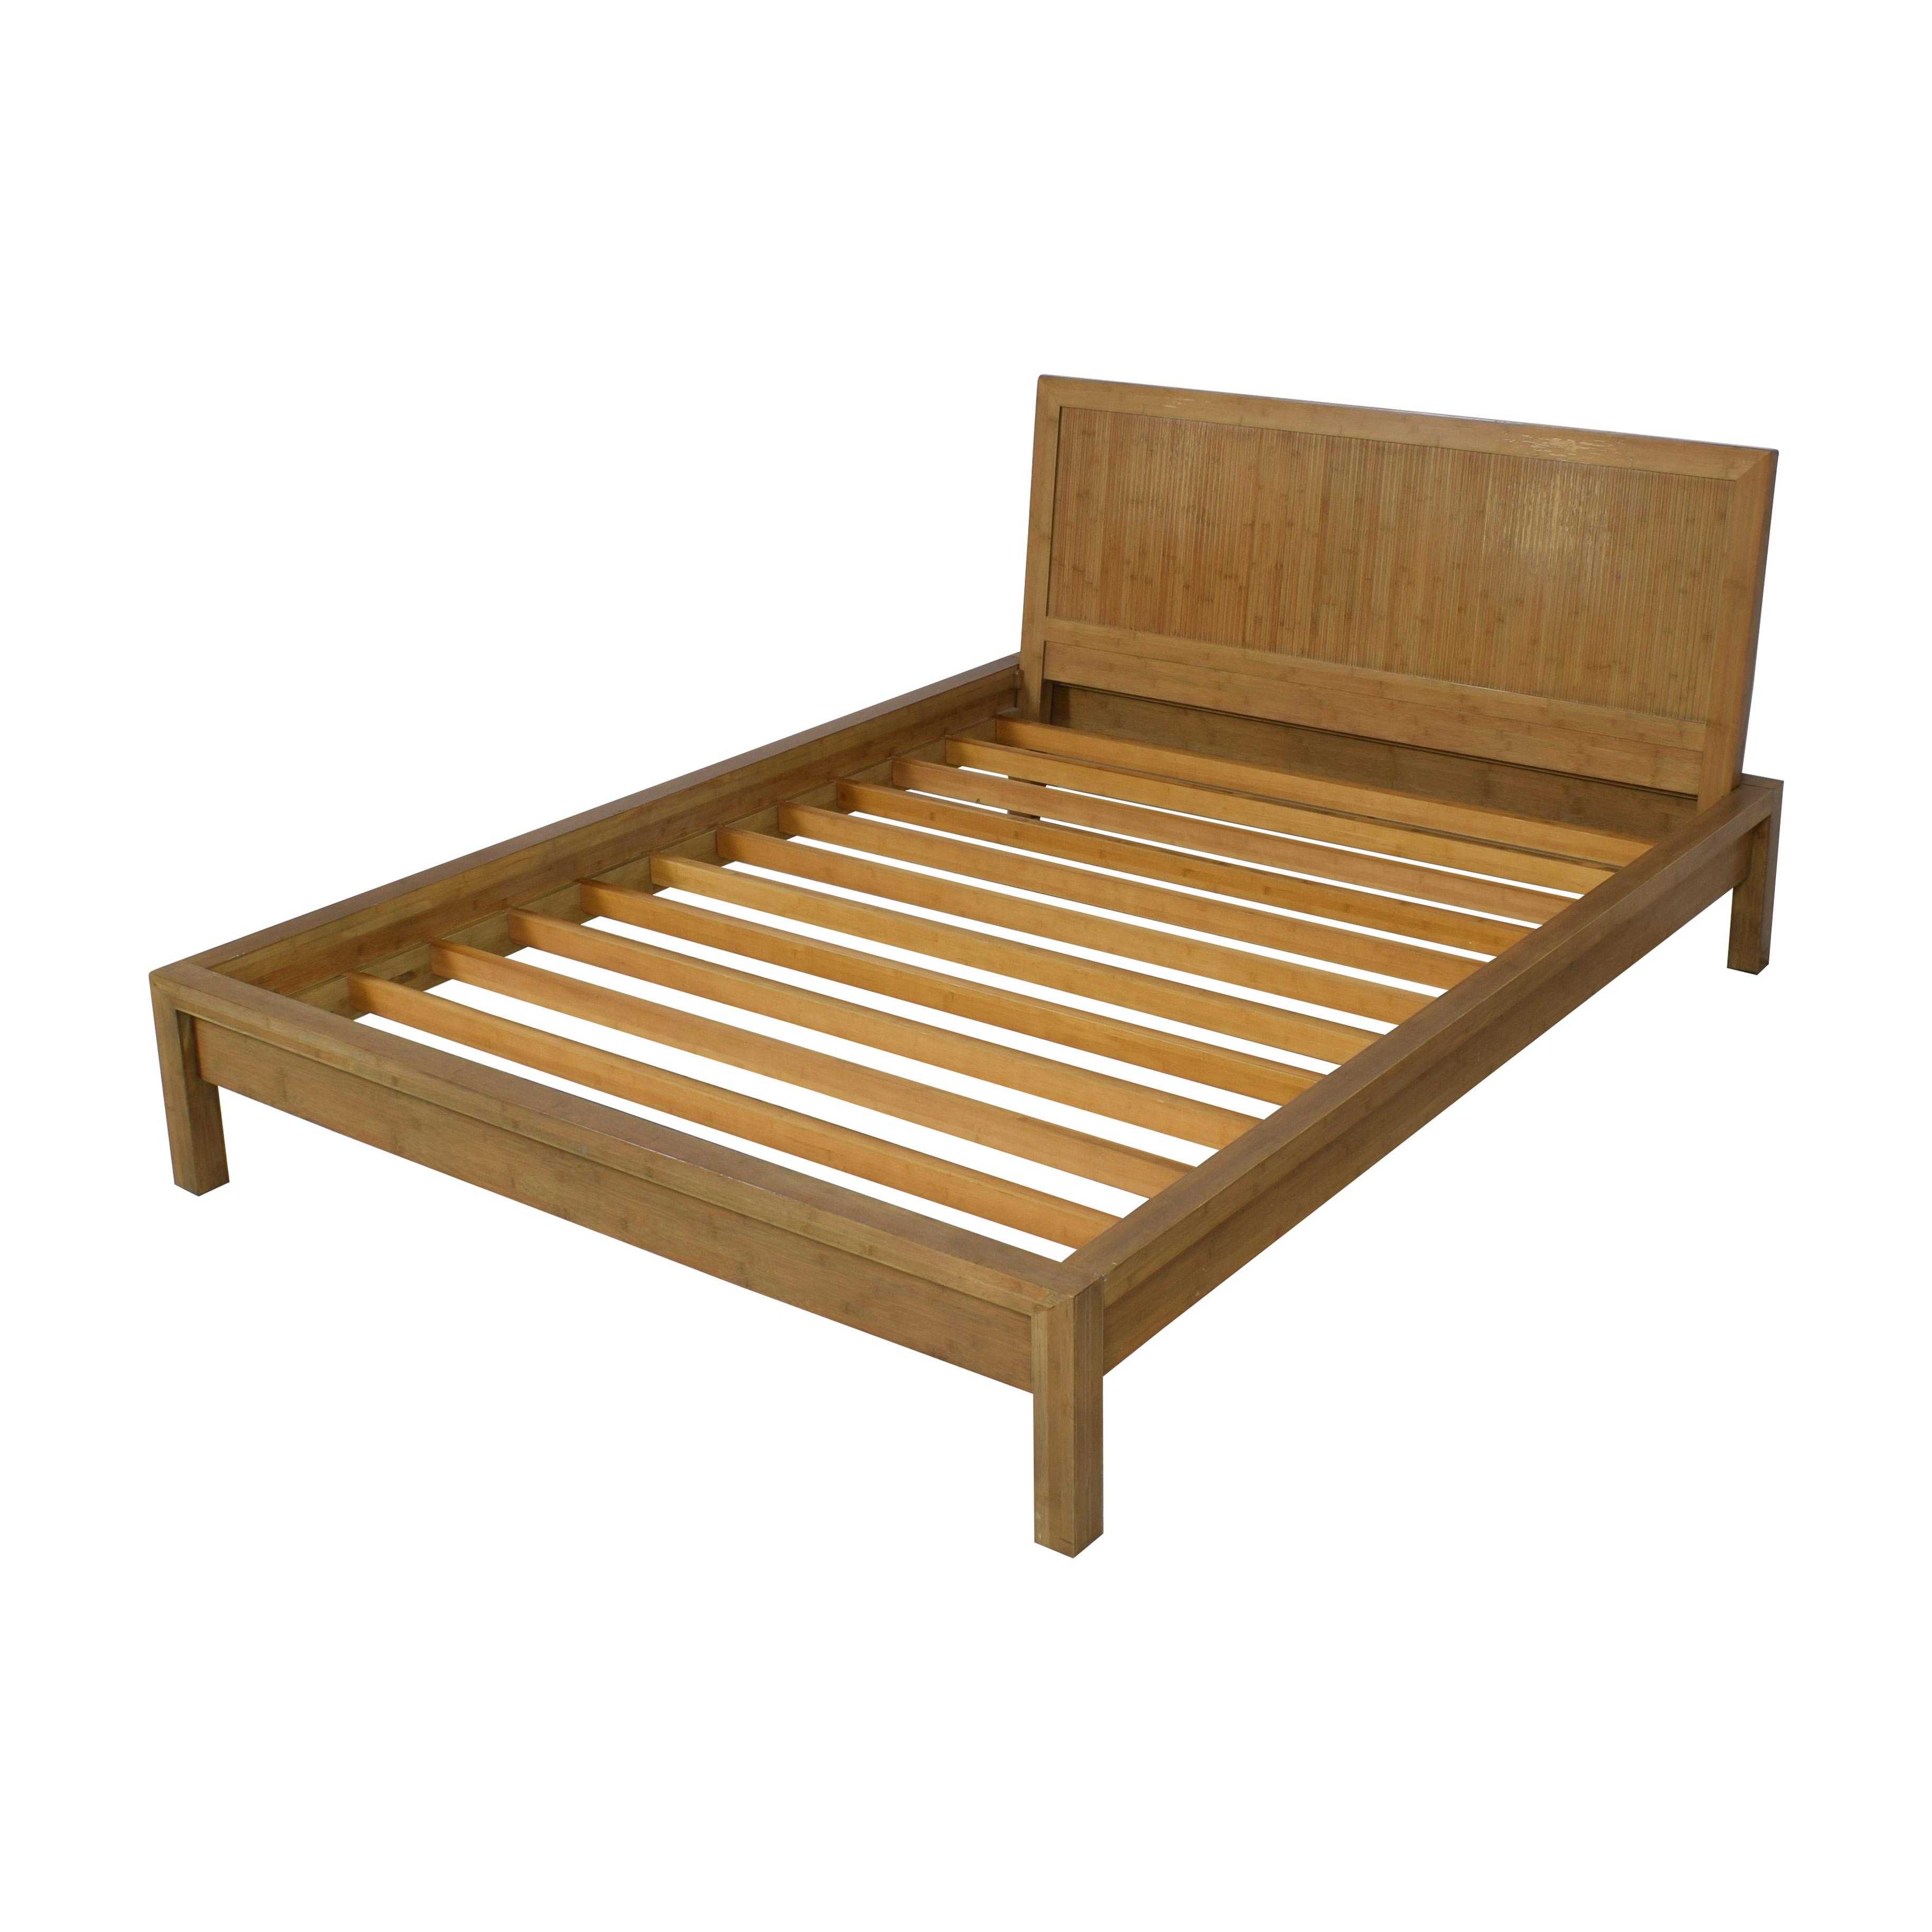 buy Room & Board Queen Bamboo Timbre Maria Yee Platform Bed Room & Board Beds